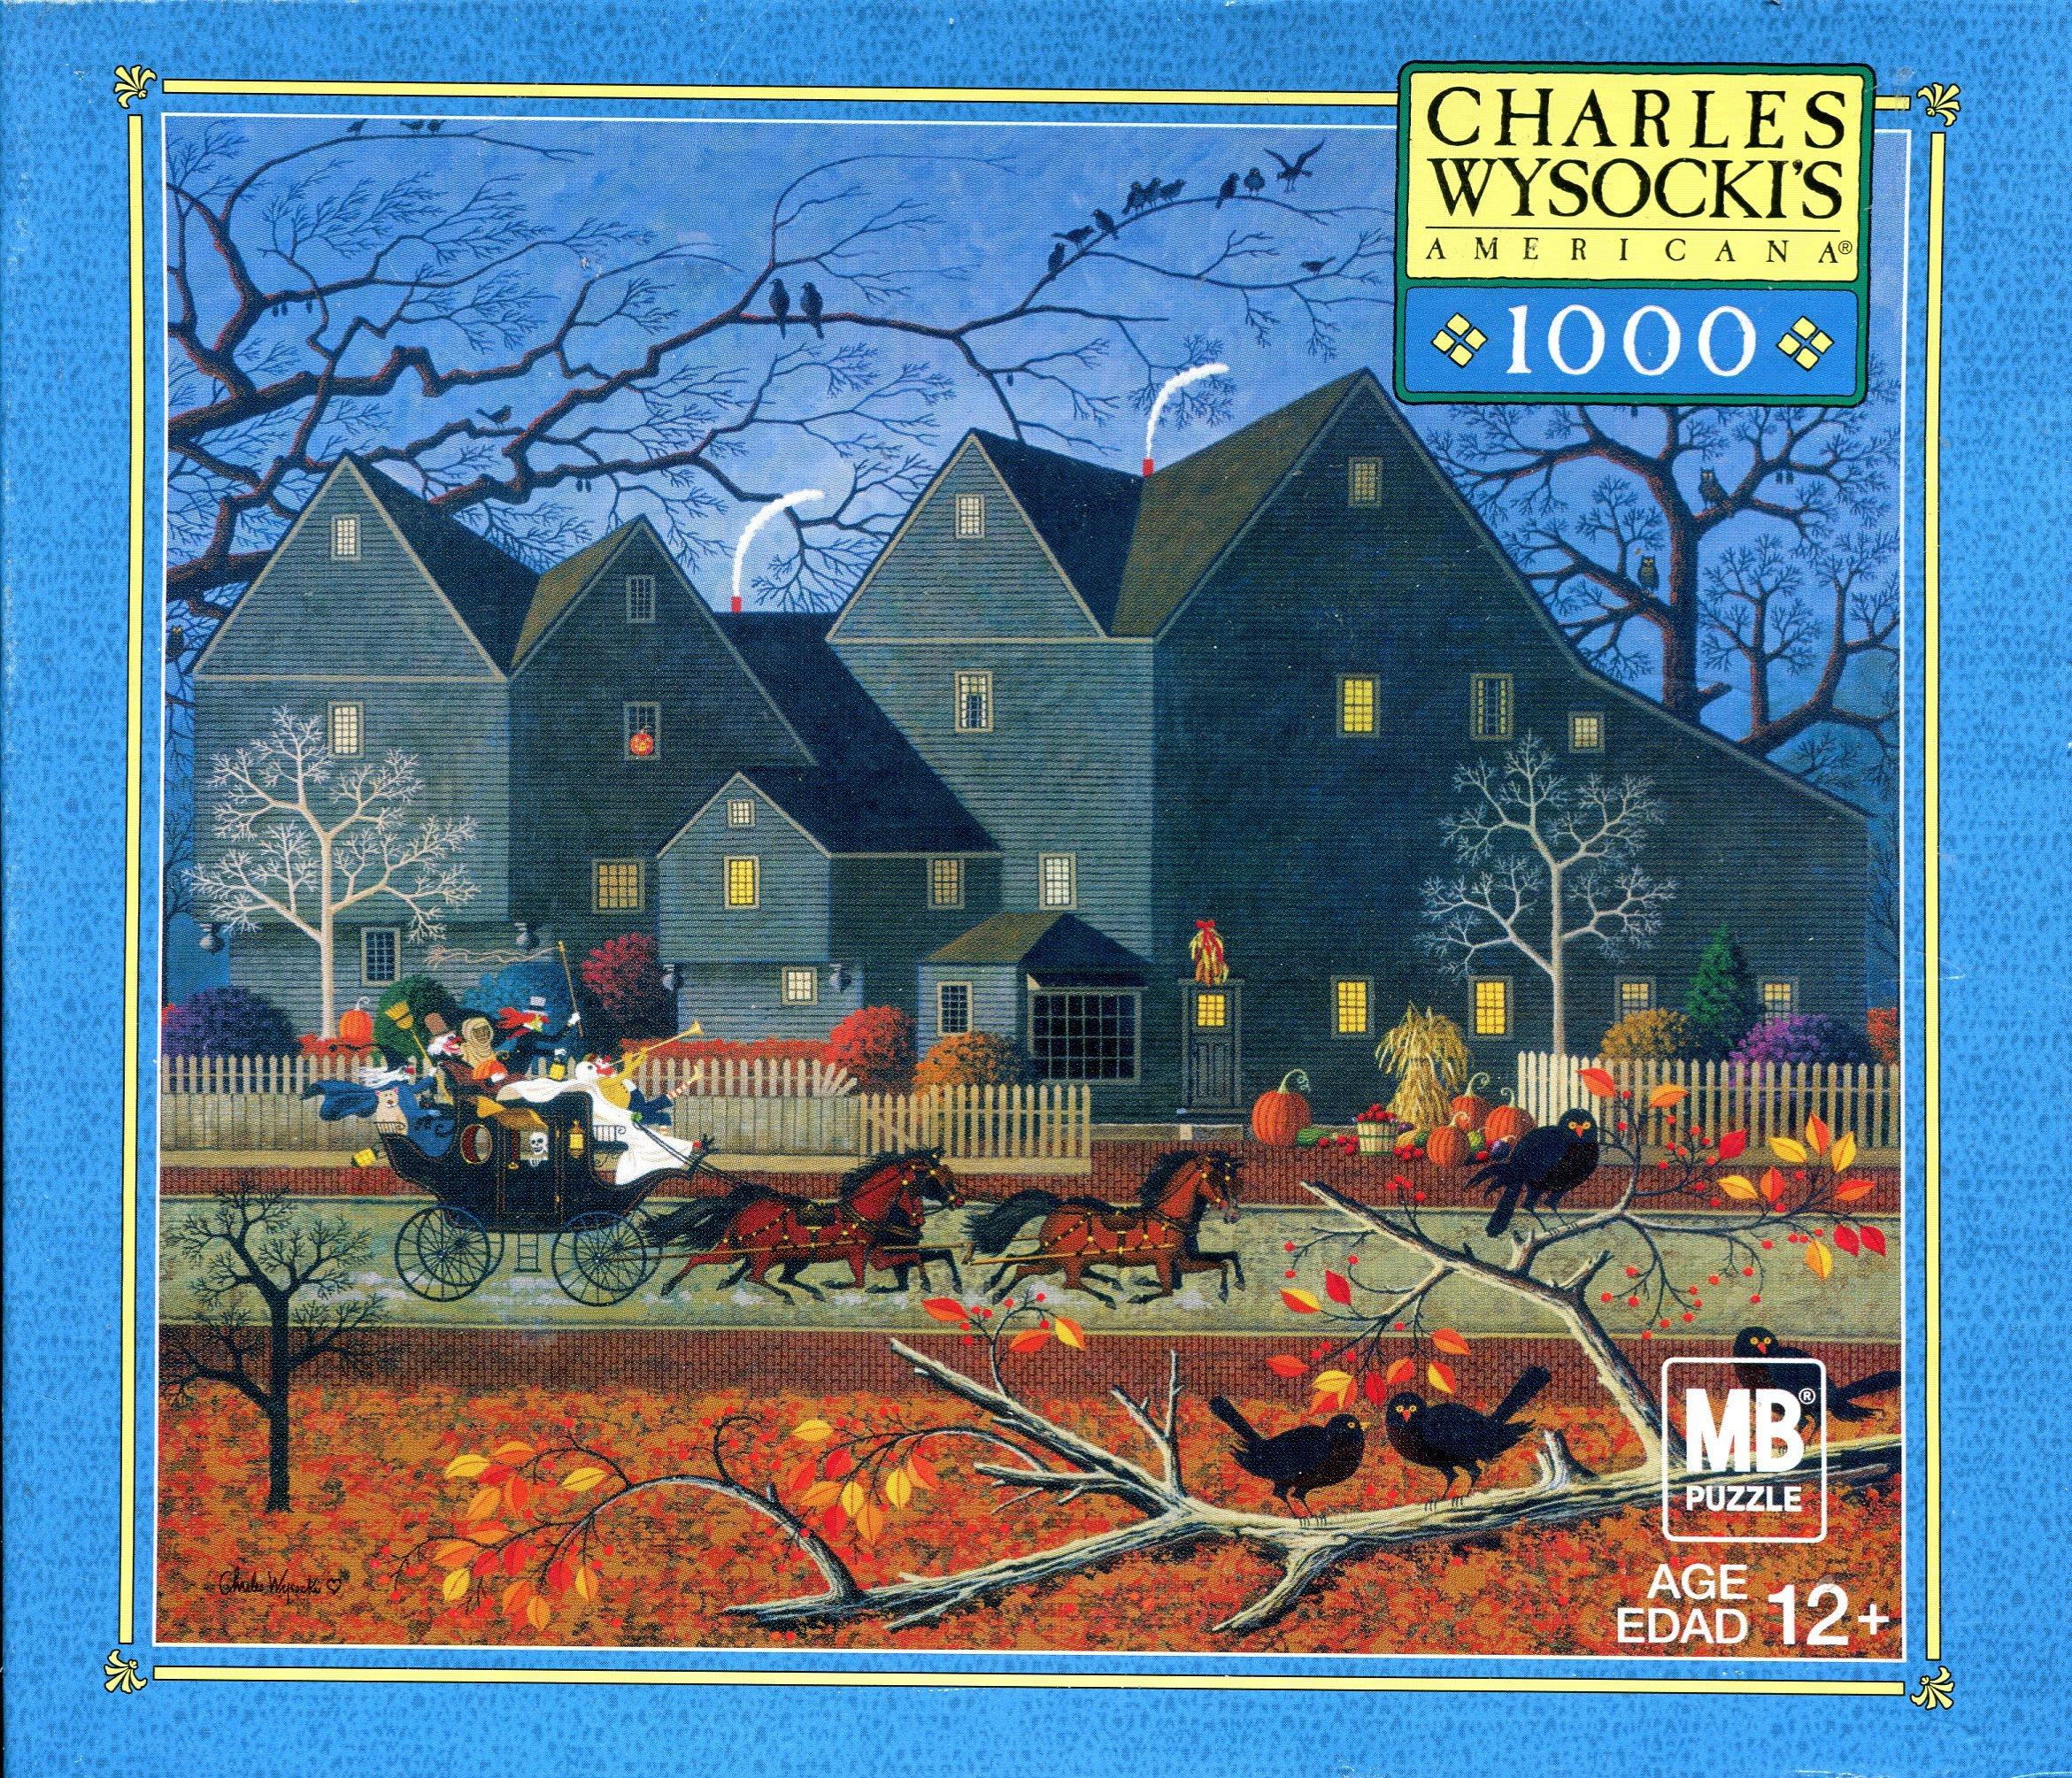 Charles Wysocki's American 1,000 Piece Jigsaw Puzzle ~ Hellraisers on Halloween Night 04679-R30 pdf